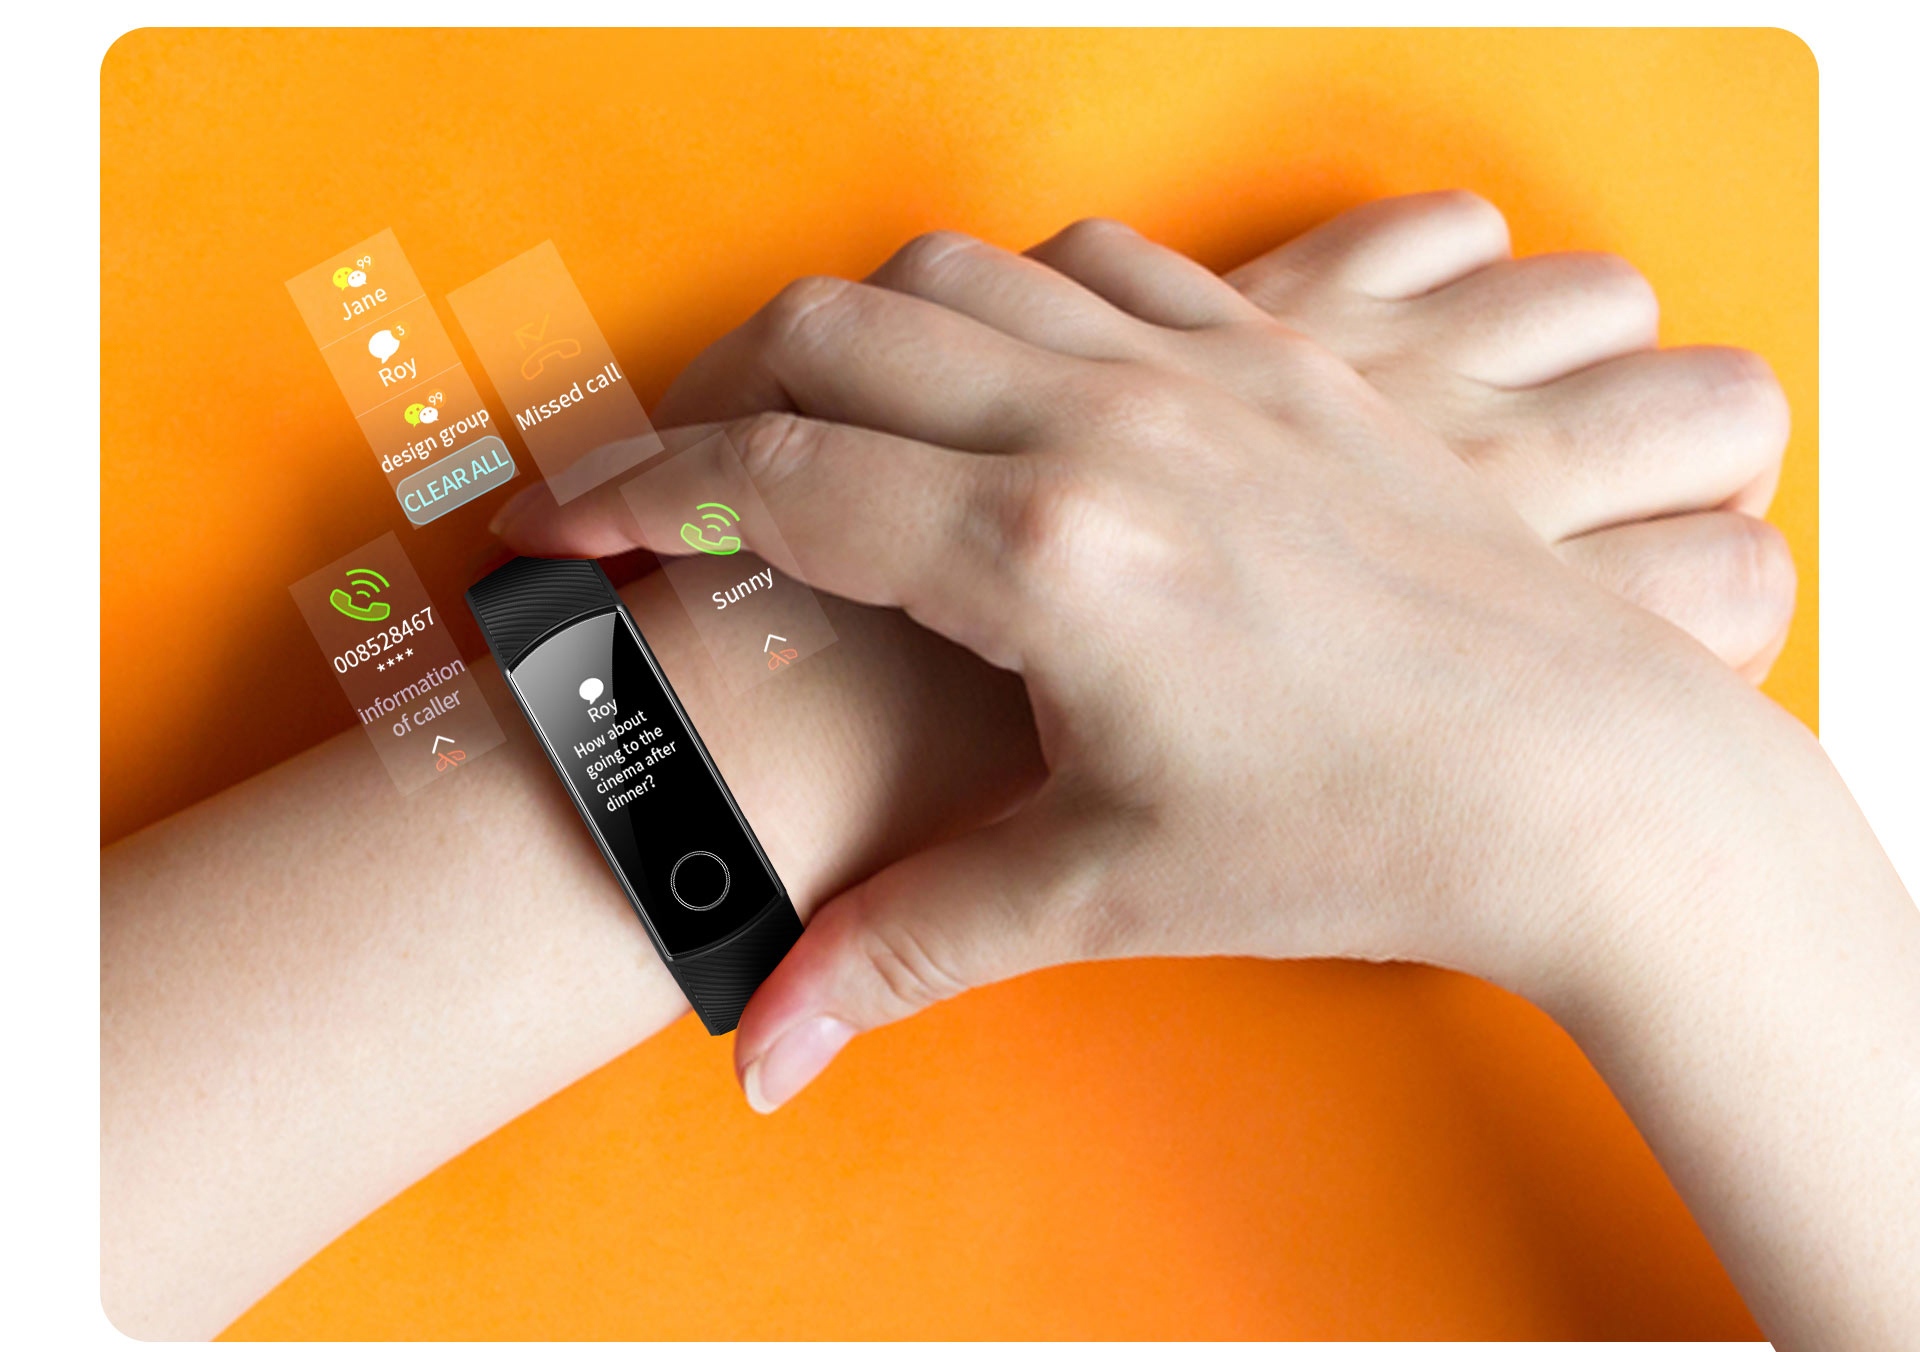 H2d289a53ac45437db08a6d52b868c634V global version Honor band 5 smart band AMOLED heart rate fitness sleep swimming sport blood oxygen tracker